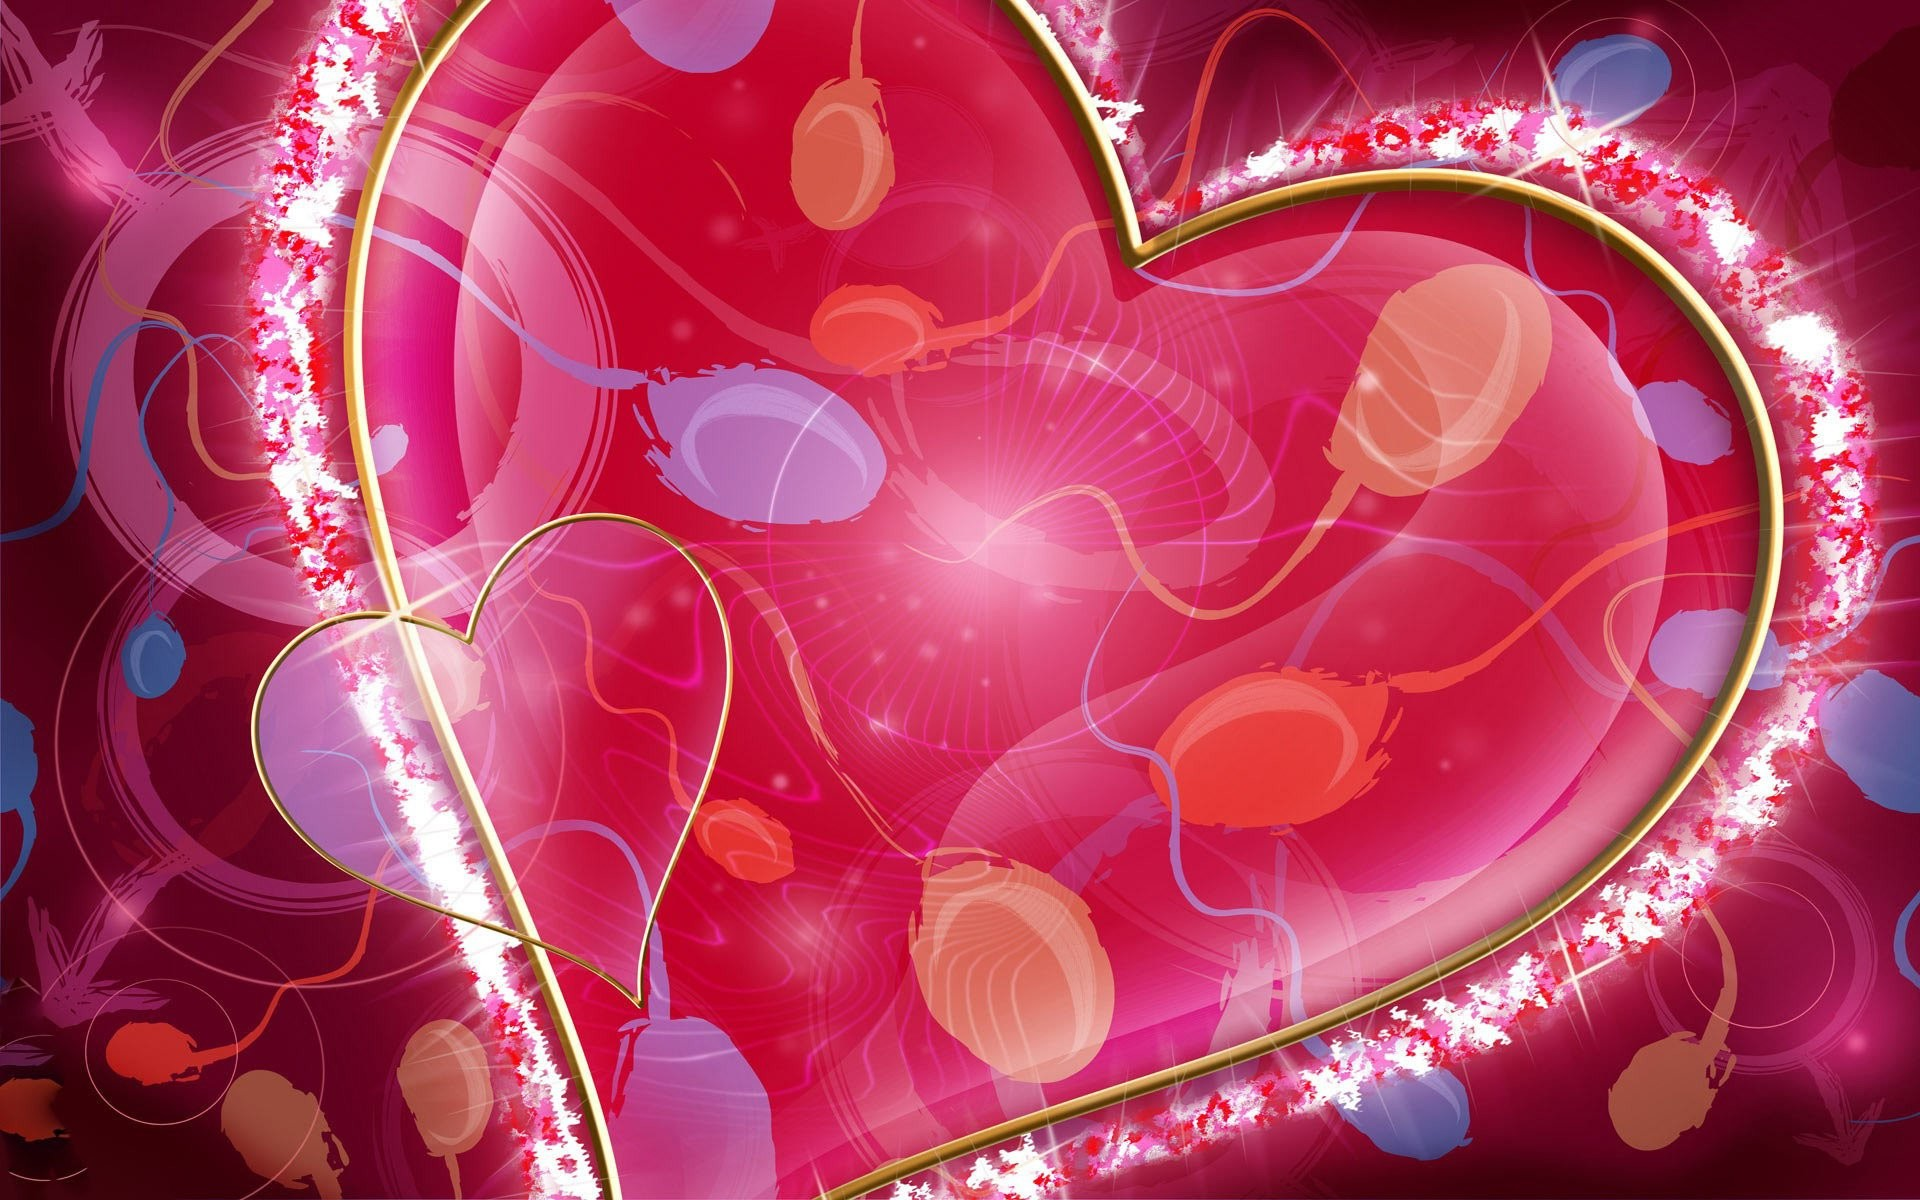 Glowing Pink Heart